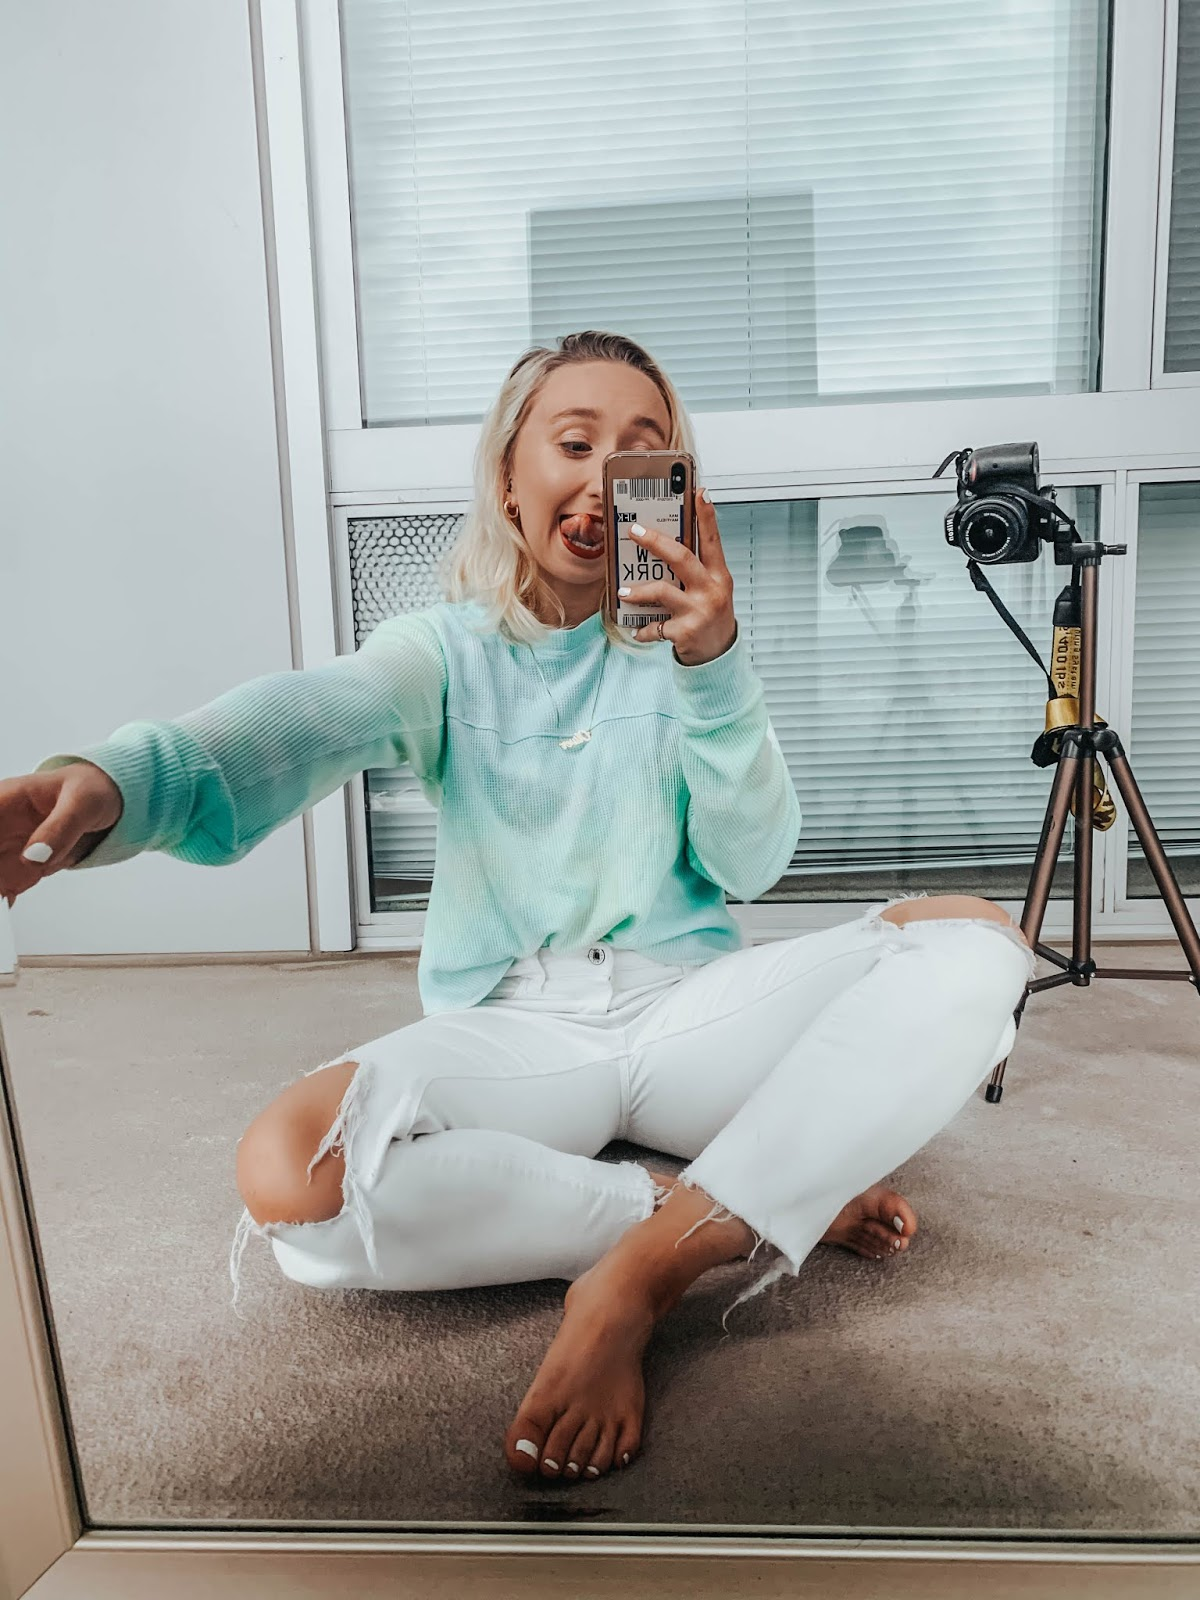 Testing Viral Tik Tok Photo Shoots: The Mirror Challenge